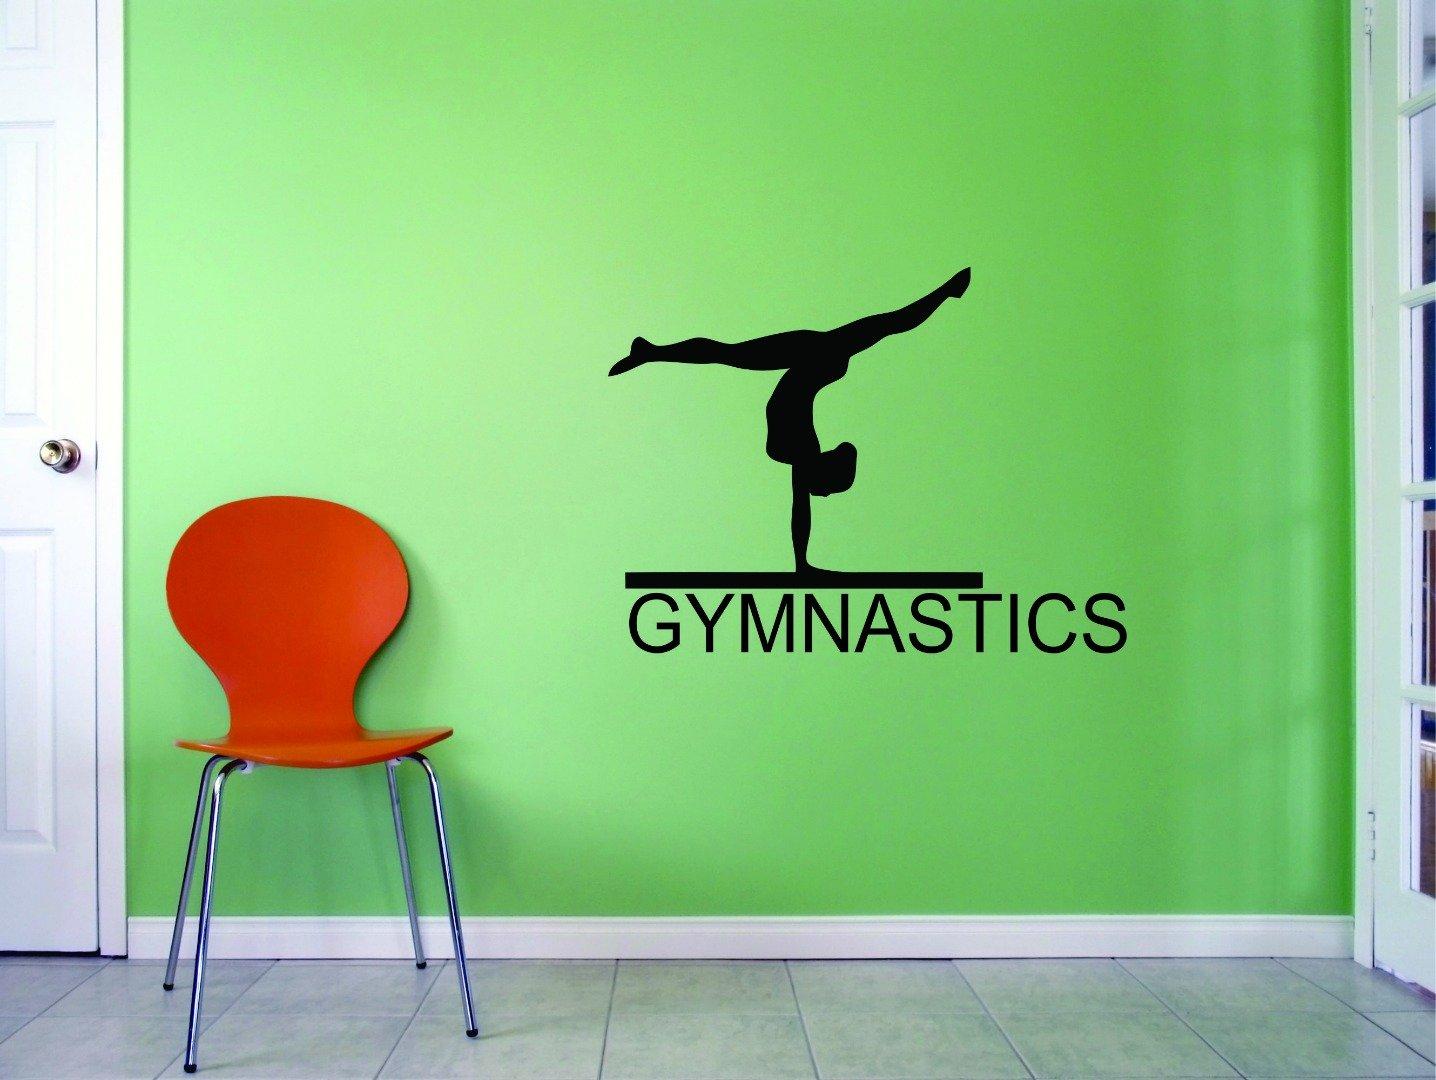 14 x 28 Black Design with Vinyl JER 355 2 Gymnastics Flipping Tumble Balance Beam Sports Girl Vinyl Wall Decal Sticker